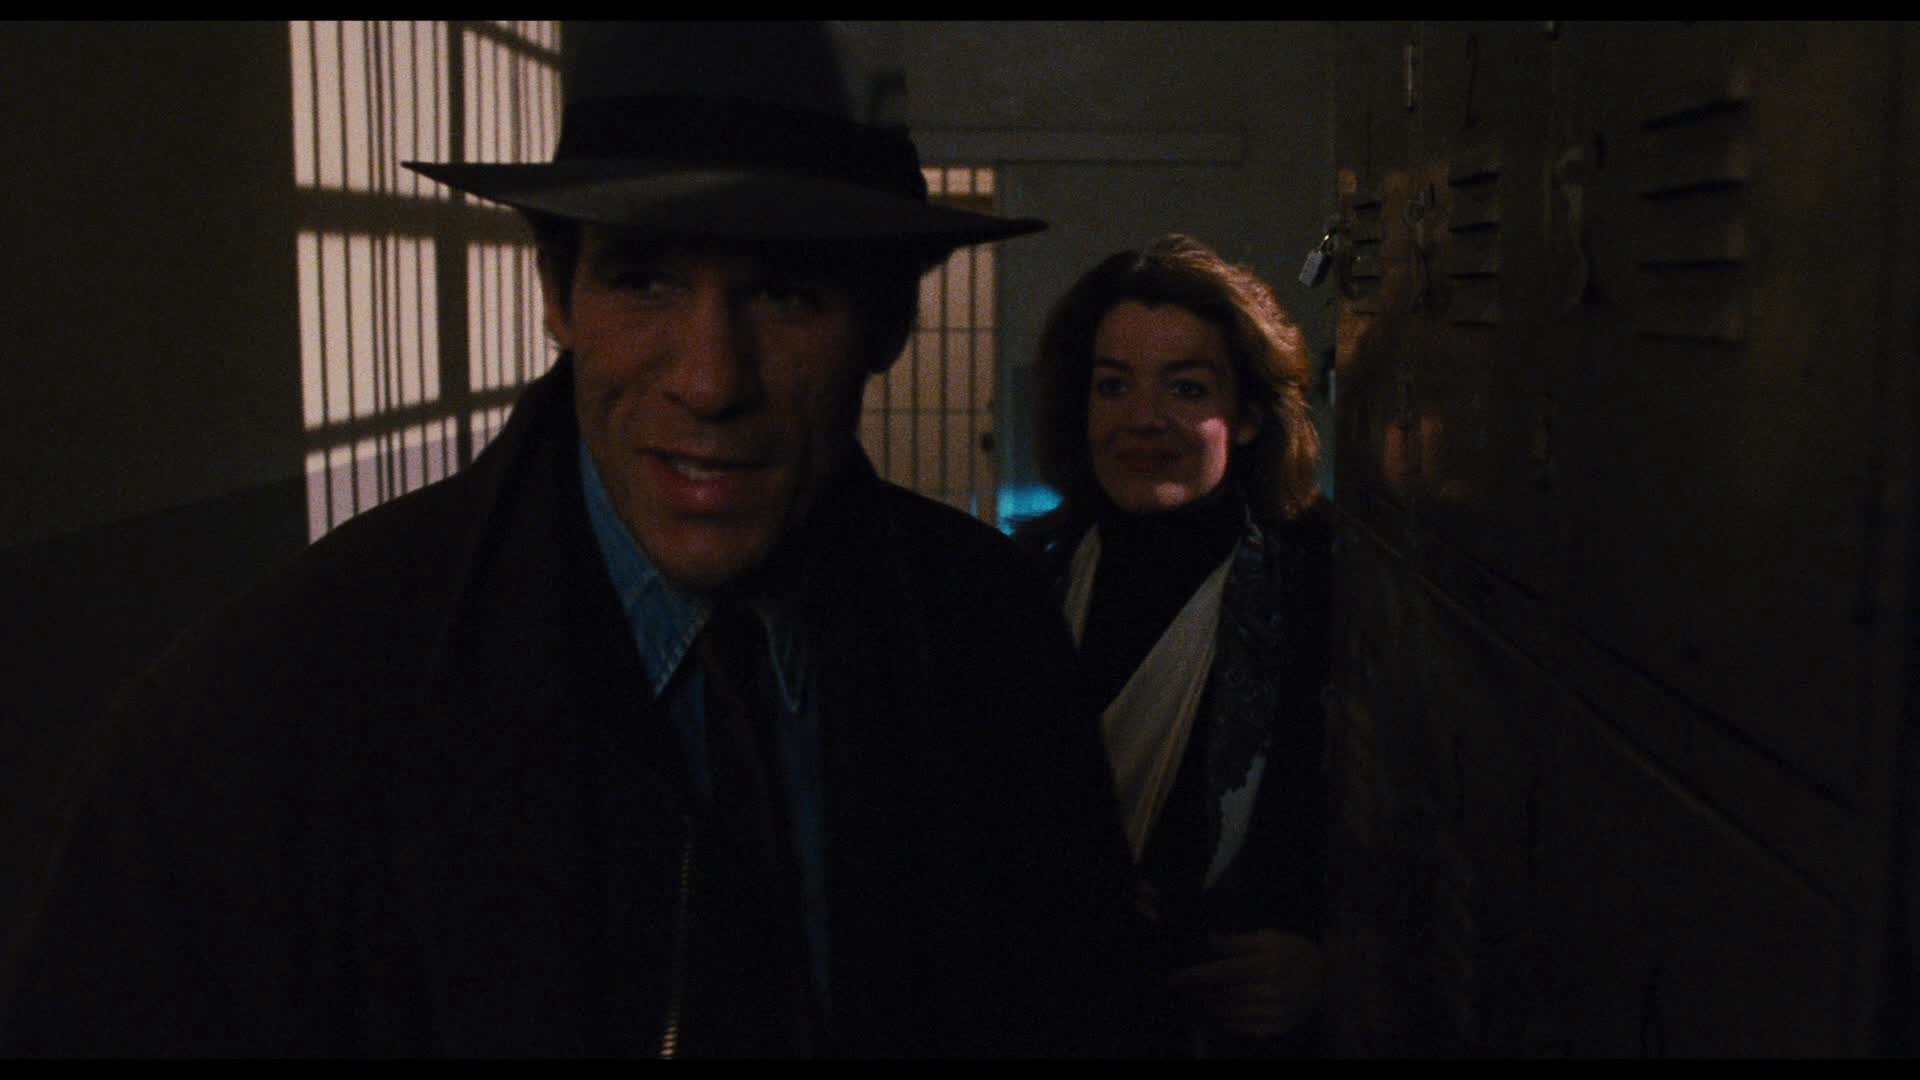 Robert Davi and Claudia Christian in Maniac Cop 2 (1990)